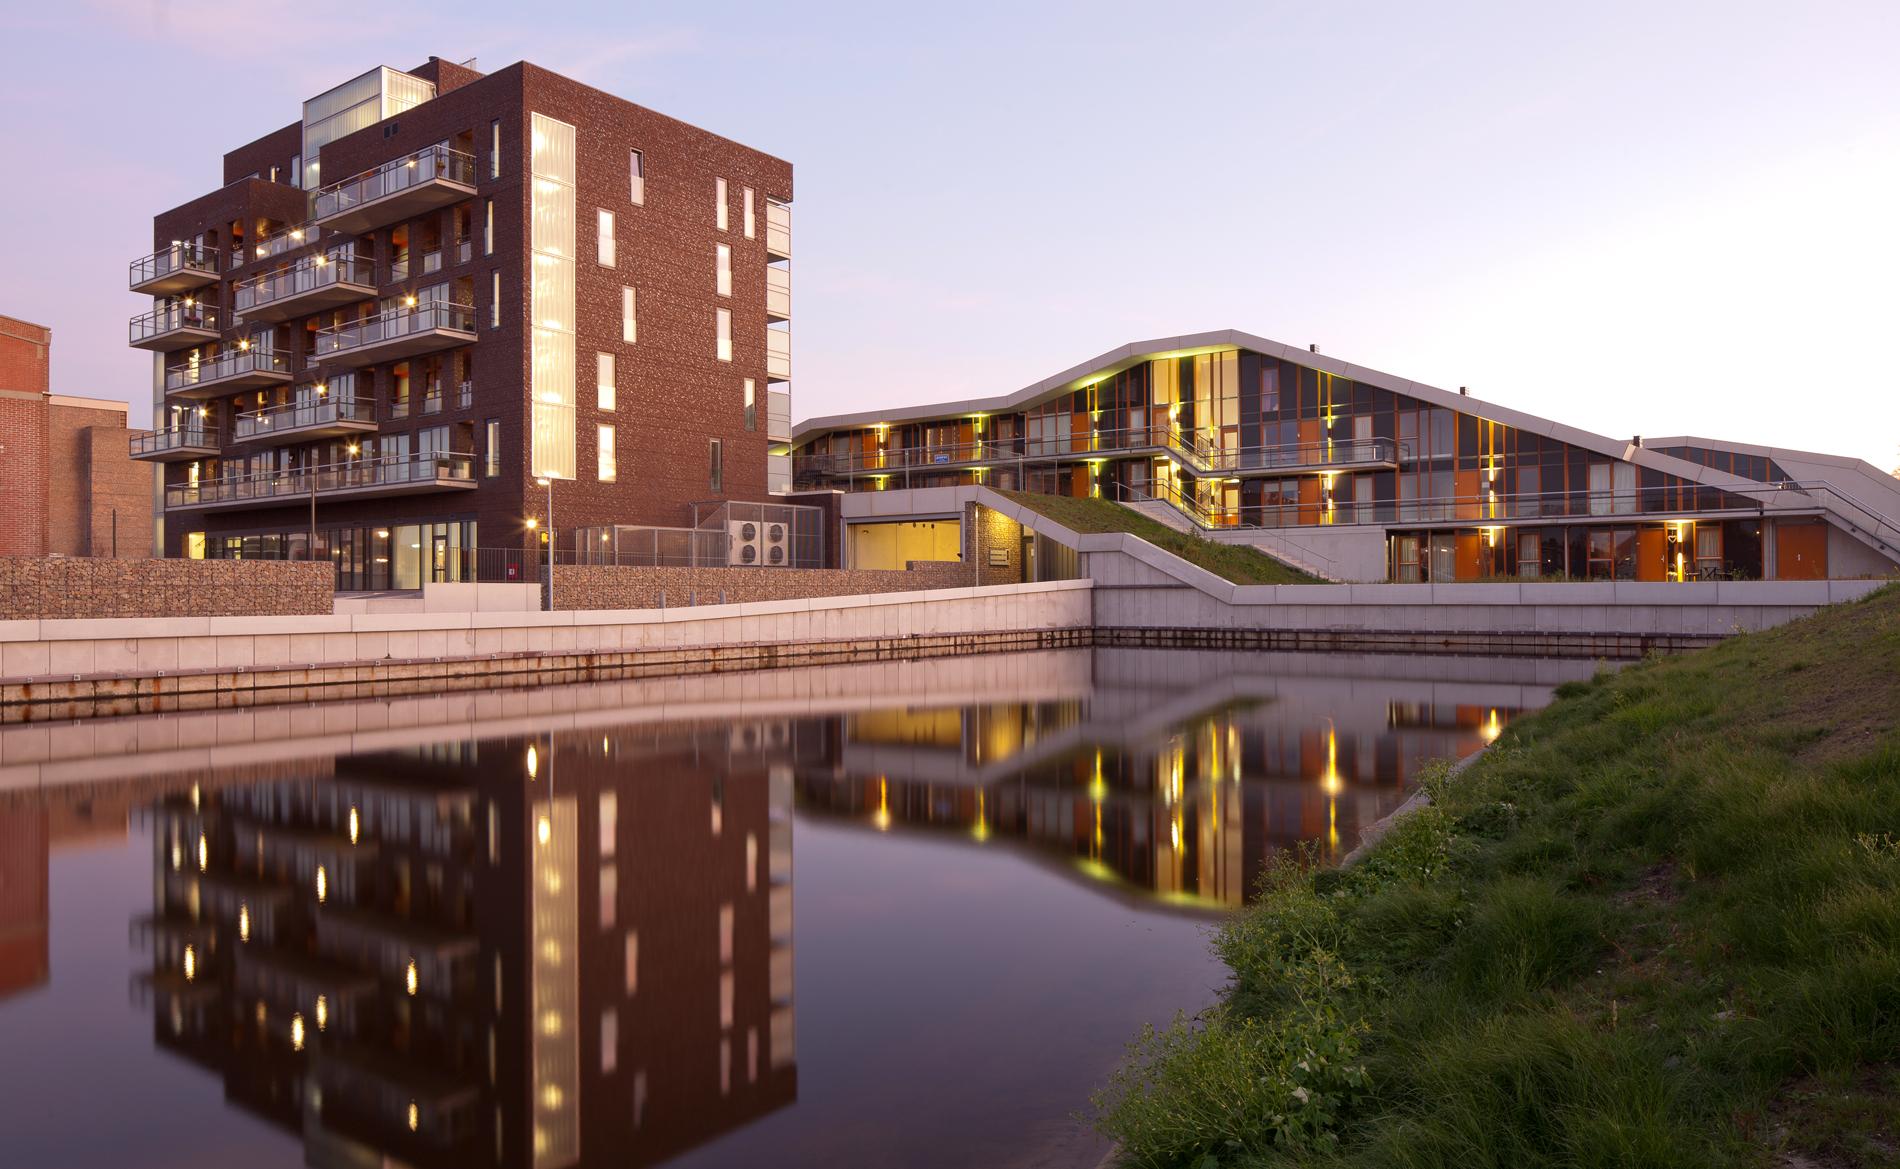 appartementen Duinpark den Helder BBHD architecten Alkmaar architectuur herstructurering